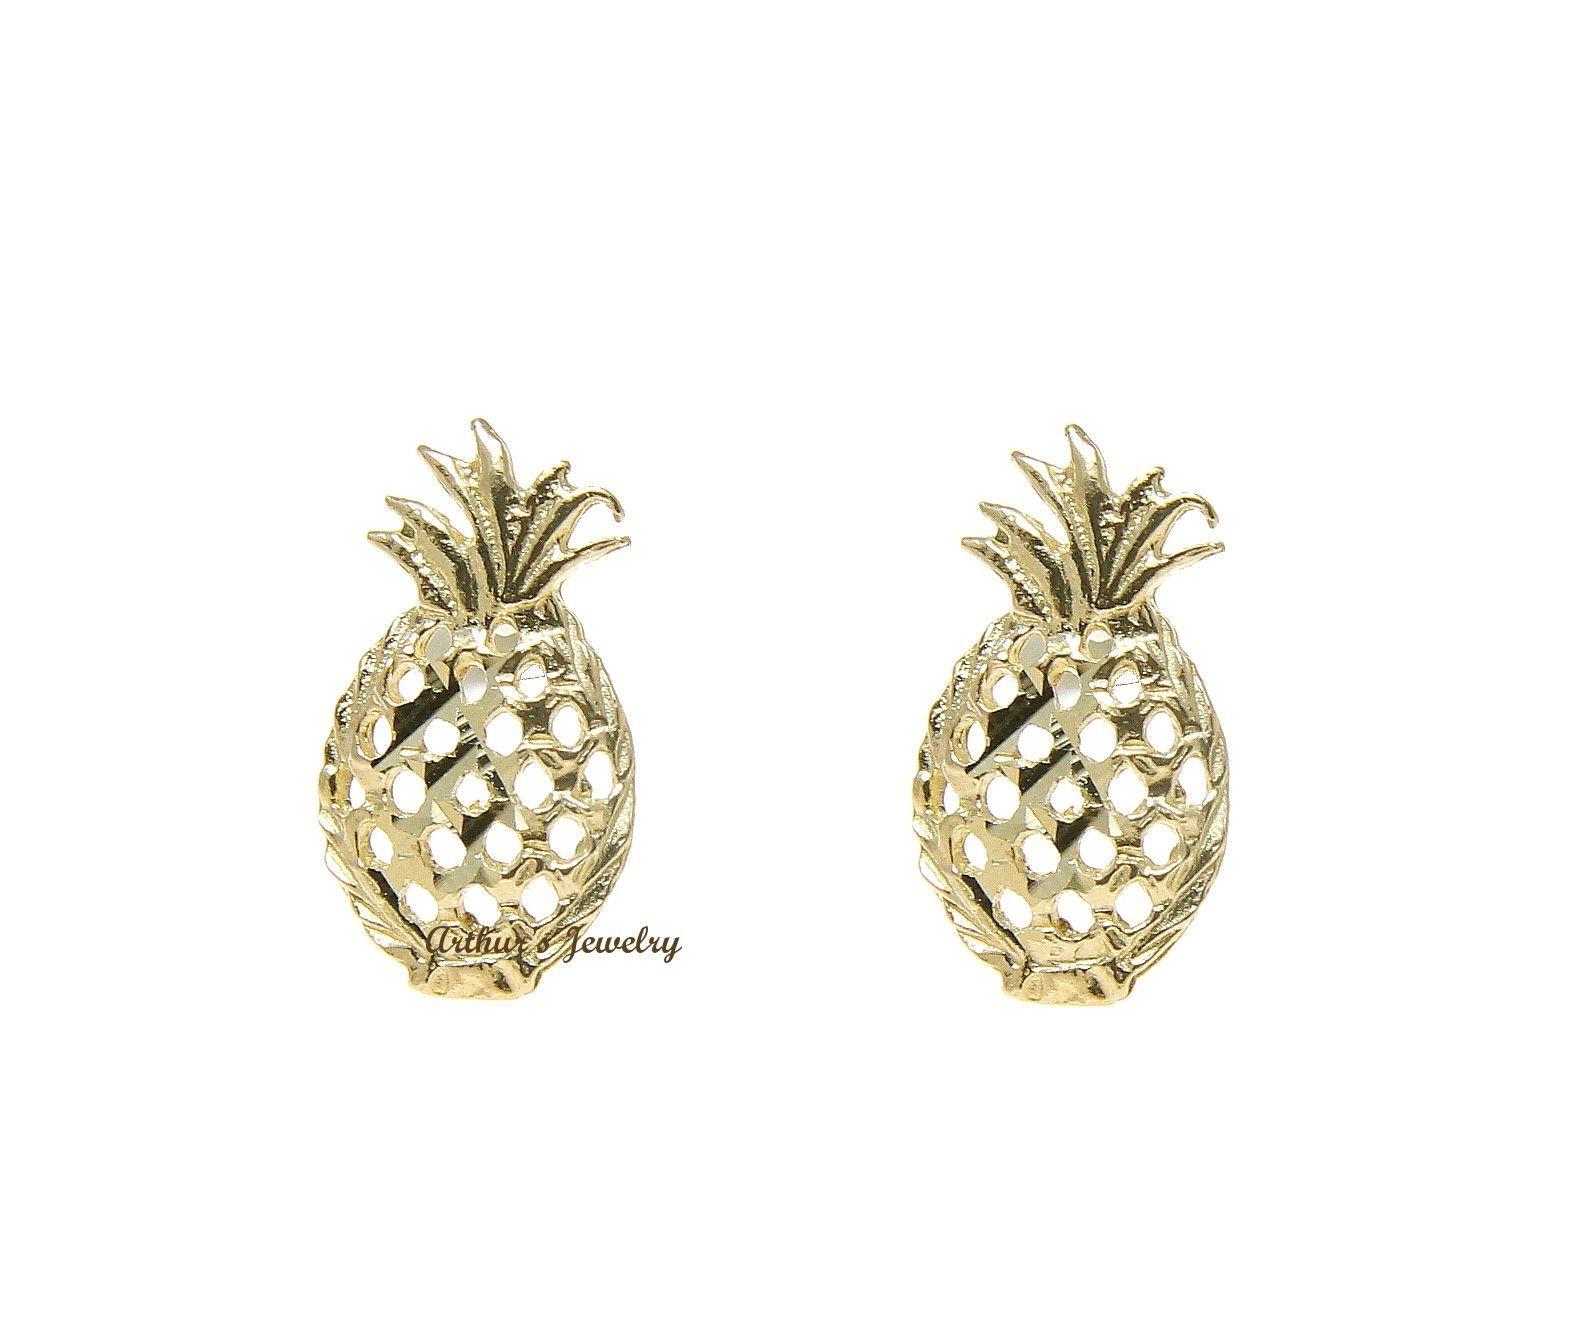 Solid 14k Yellow Gold Hawaiian Diamond Cut Pineapple Stud Earrings Small  55mm